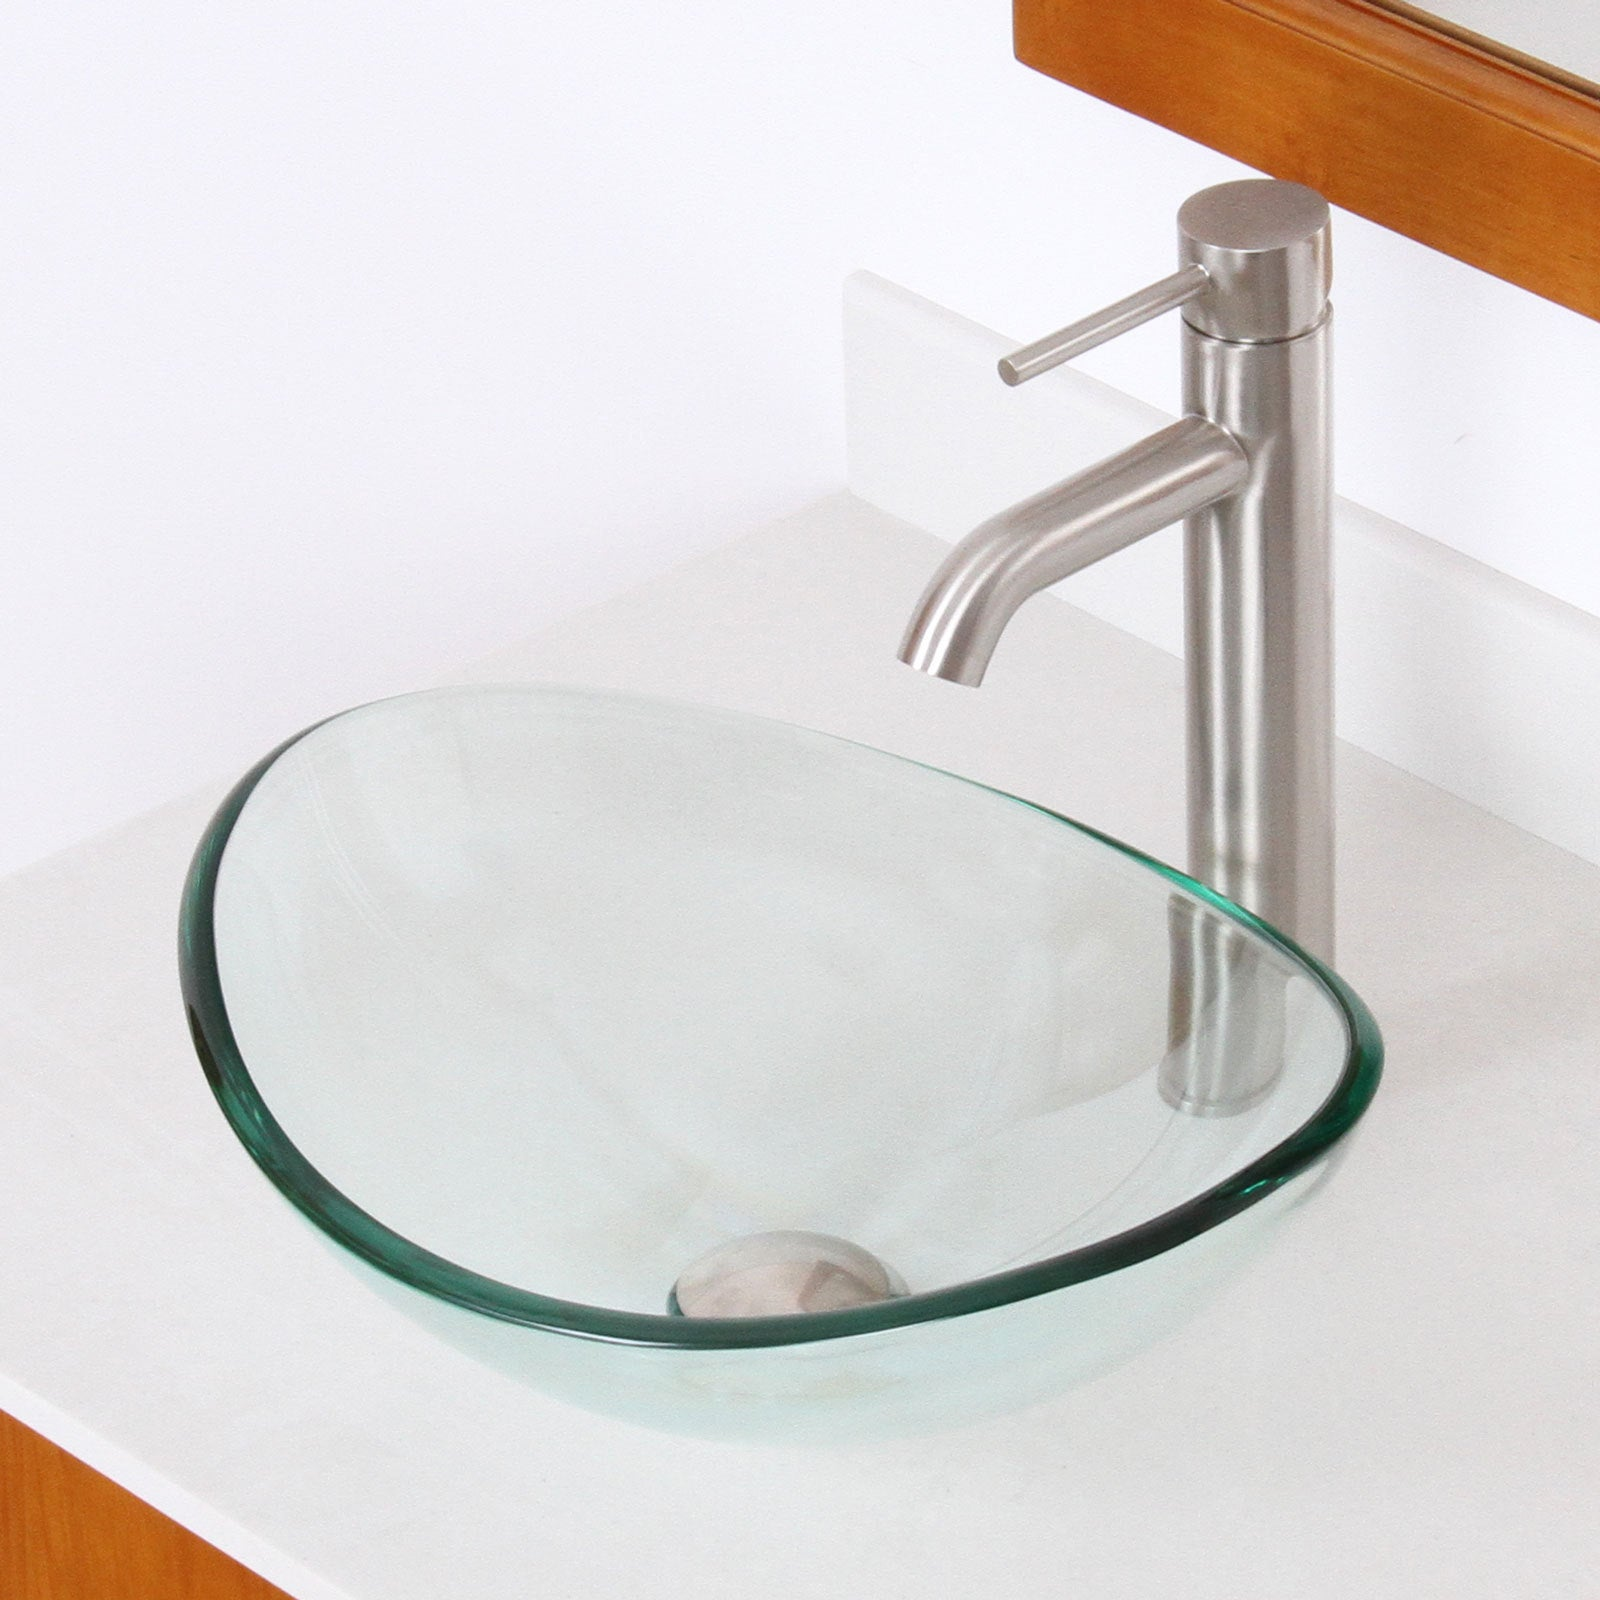 Elite 1418 F371023 Oval Tempered Glass Bathroom Vessel Sink Overstock 9513839